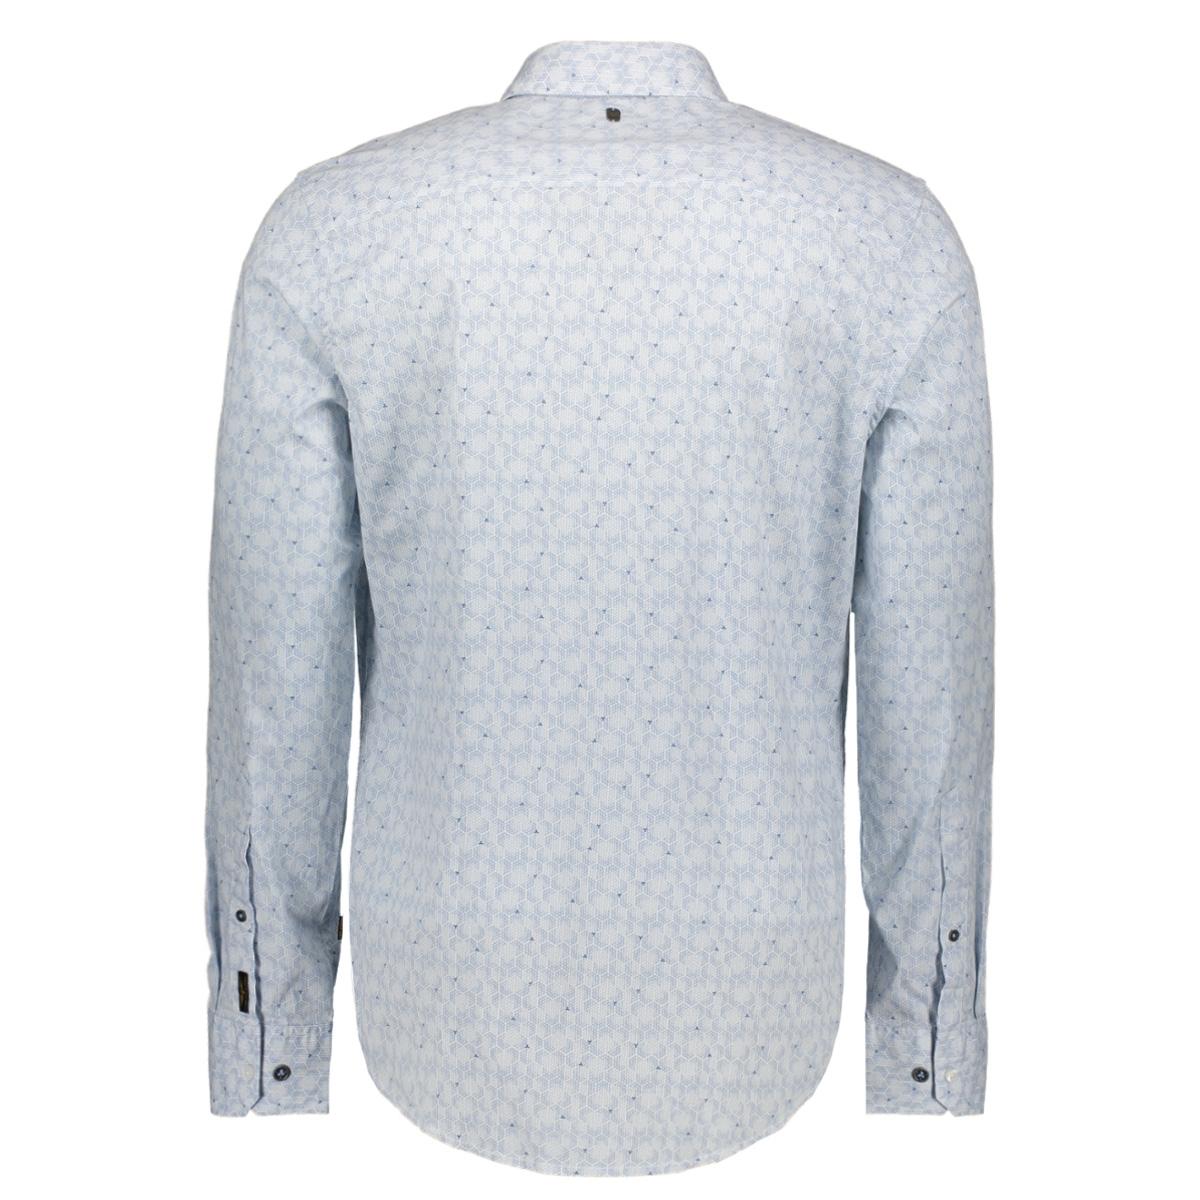 psi191206 pme legend overhemd 7003